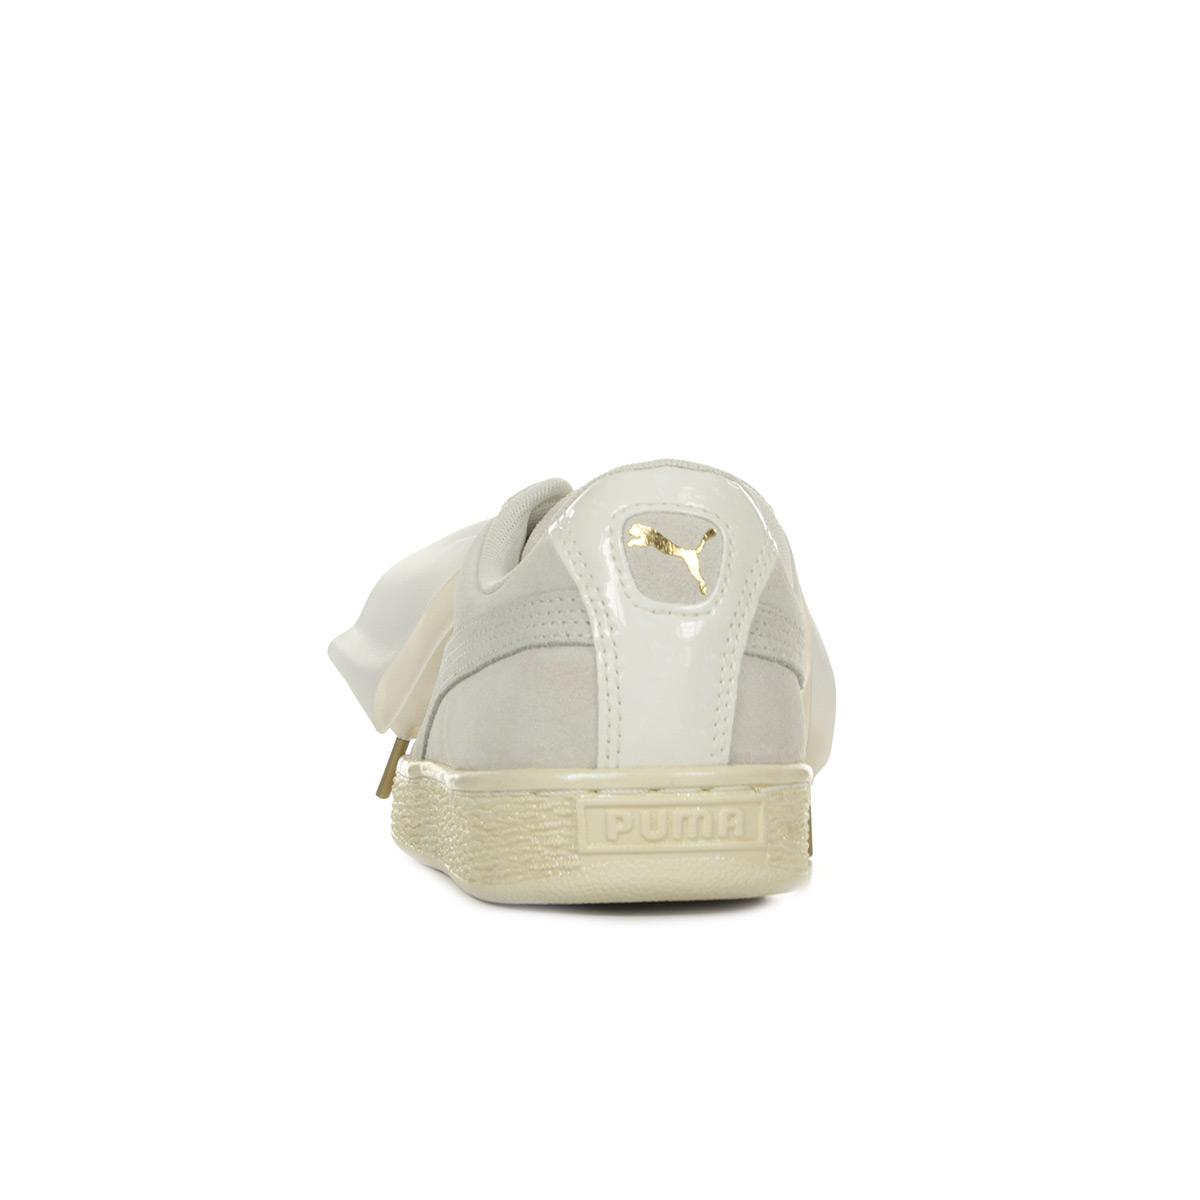 Puma Suede Heart Satin Wn's 36271404, Baskets mode femme